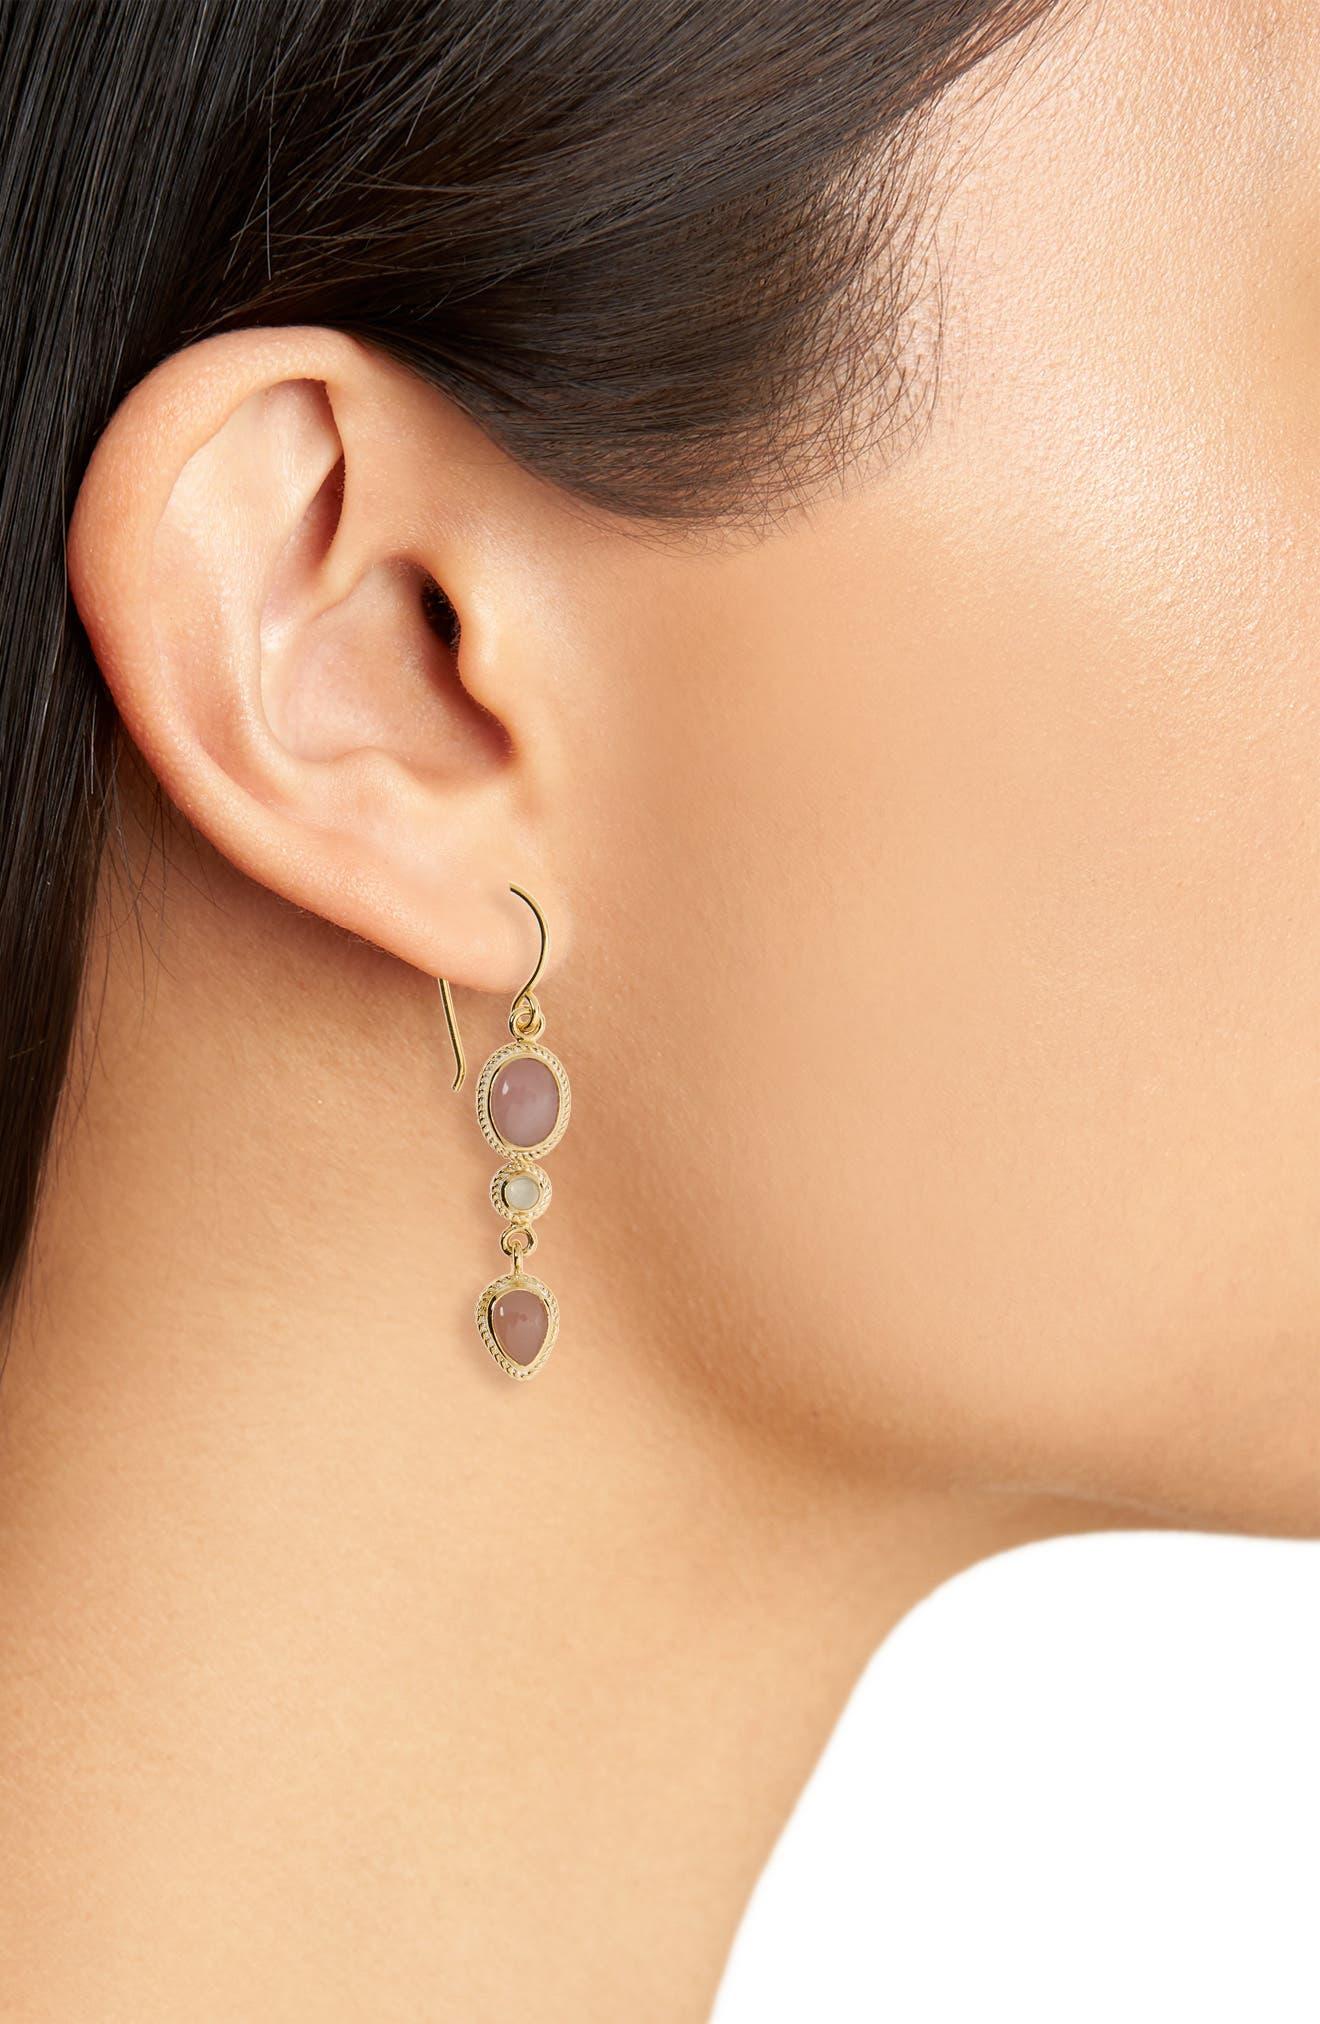 Stone Drop Earrings,                             Alternate thumbnail 2, color,                             Gold/ Guava Quartz/ Moonstone